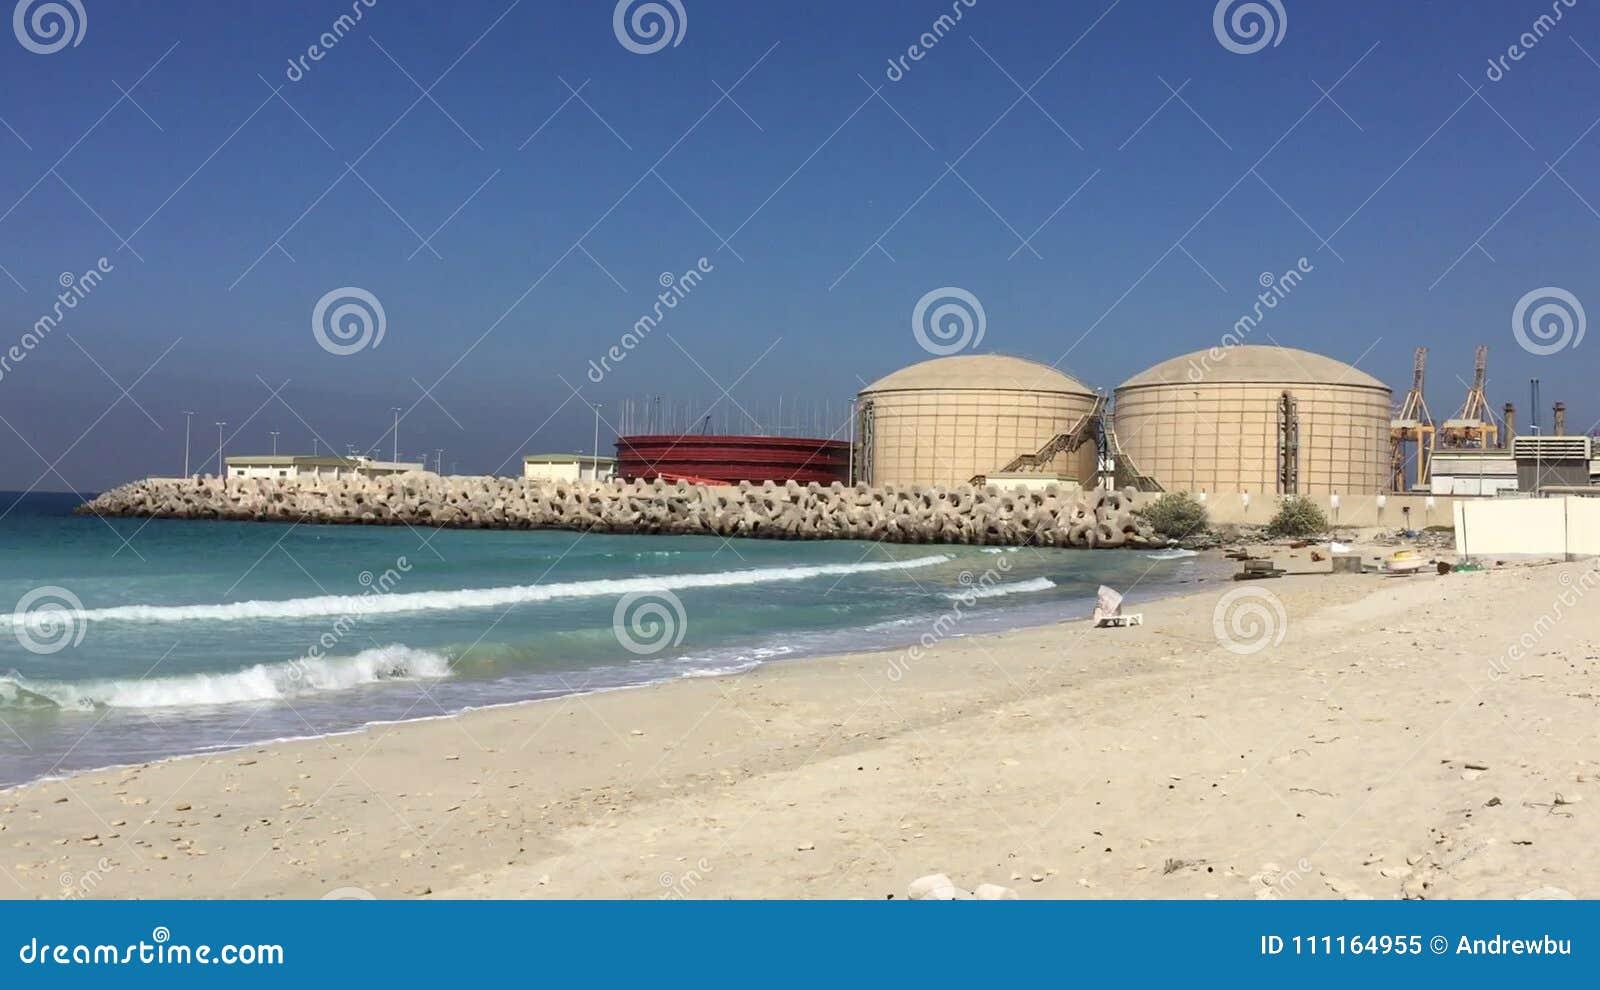 Storage tanks for salt water on desalination plant at seashore